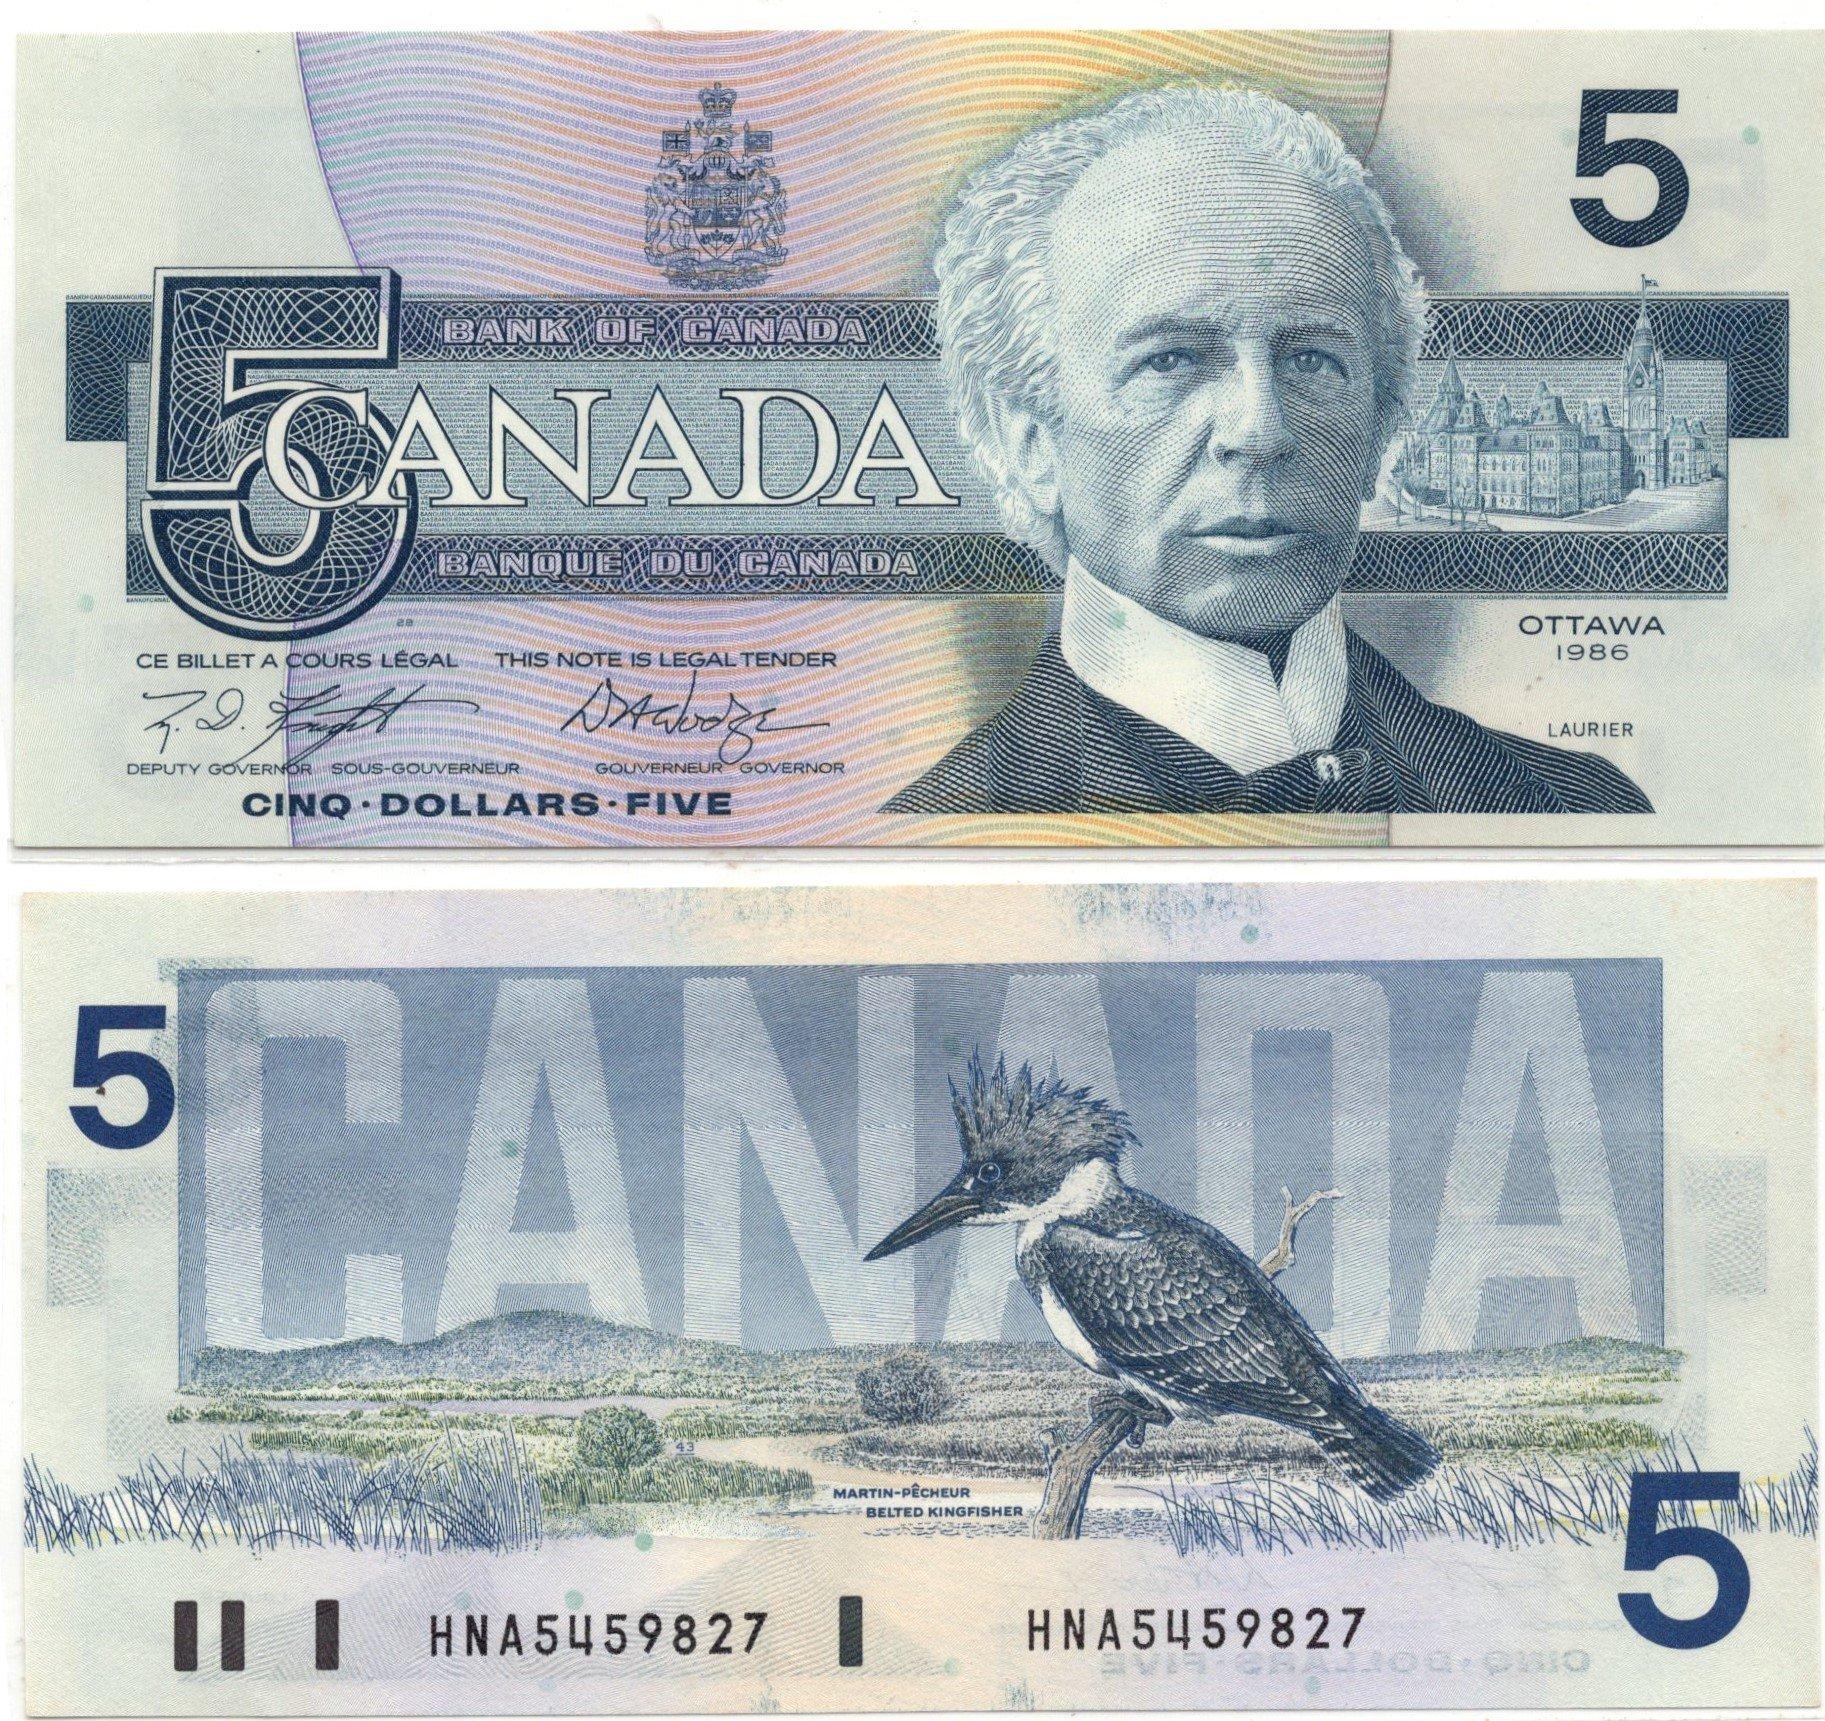 Canada 5 dollars 1986